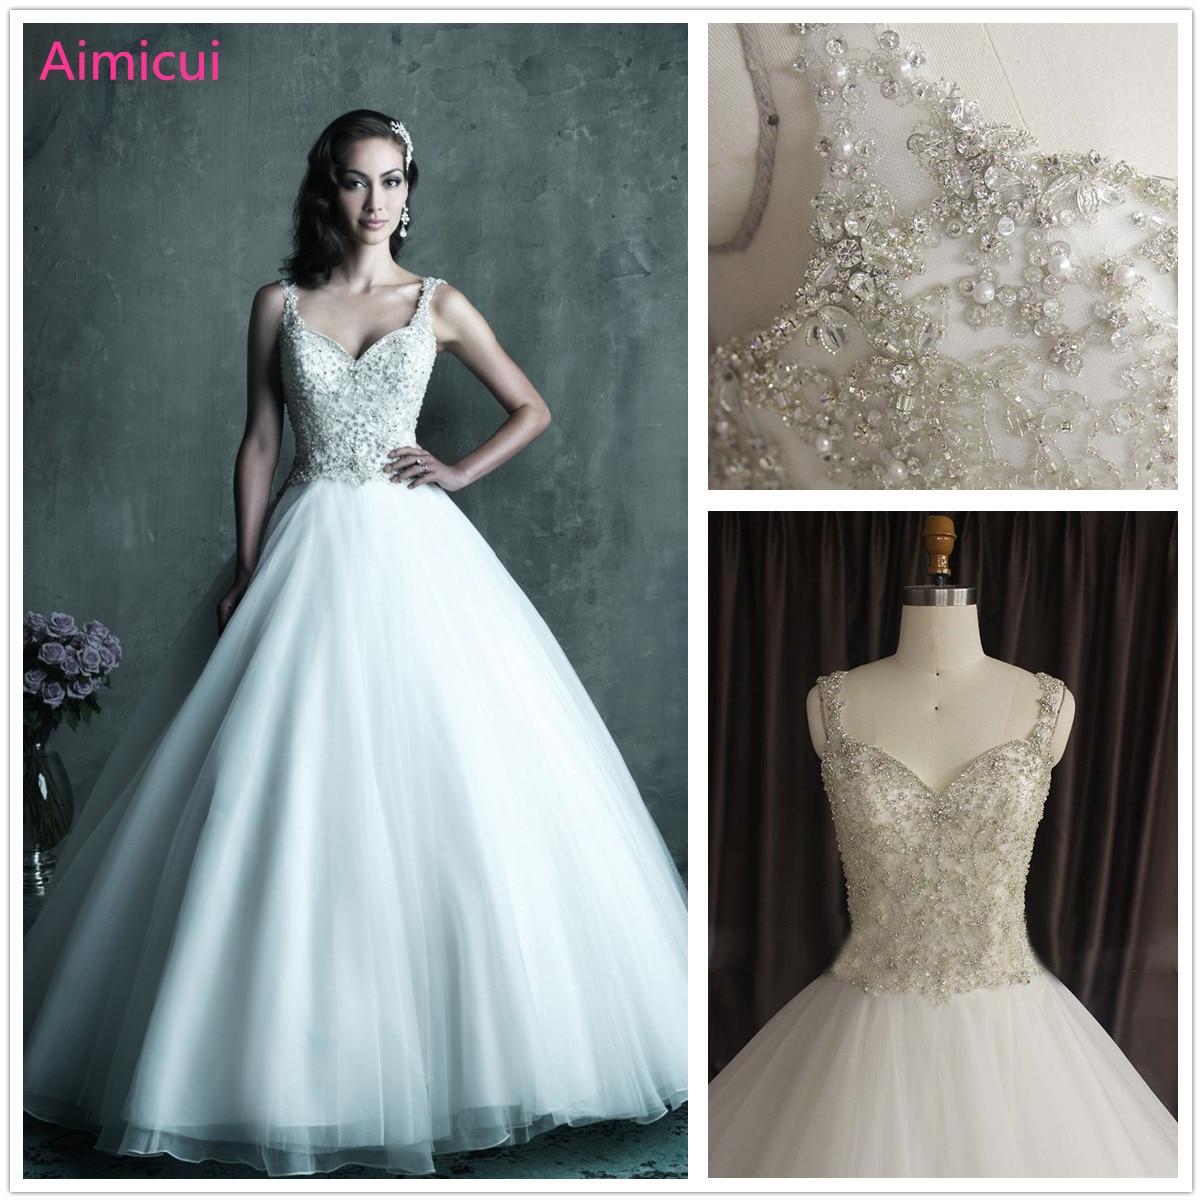 Luxury Robe De Mariage Wedding Dress New Fashion 2019 Beading Ball Gown Wedding Dresses Beading Crystal Vestidos De Novia